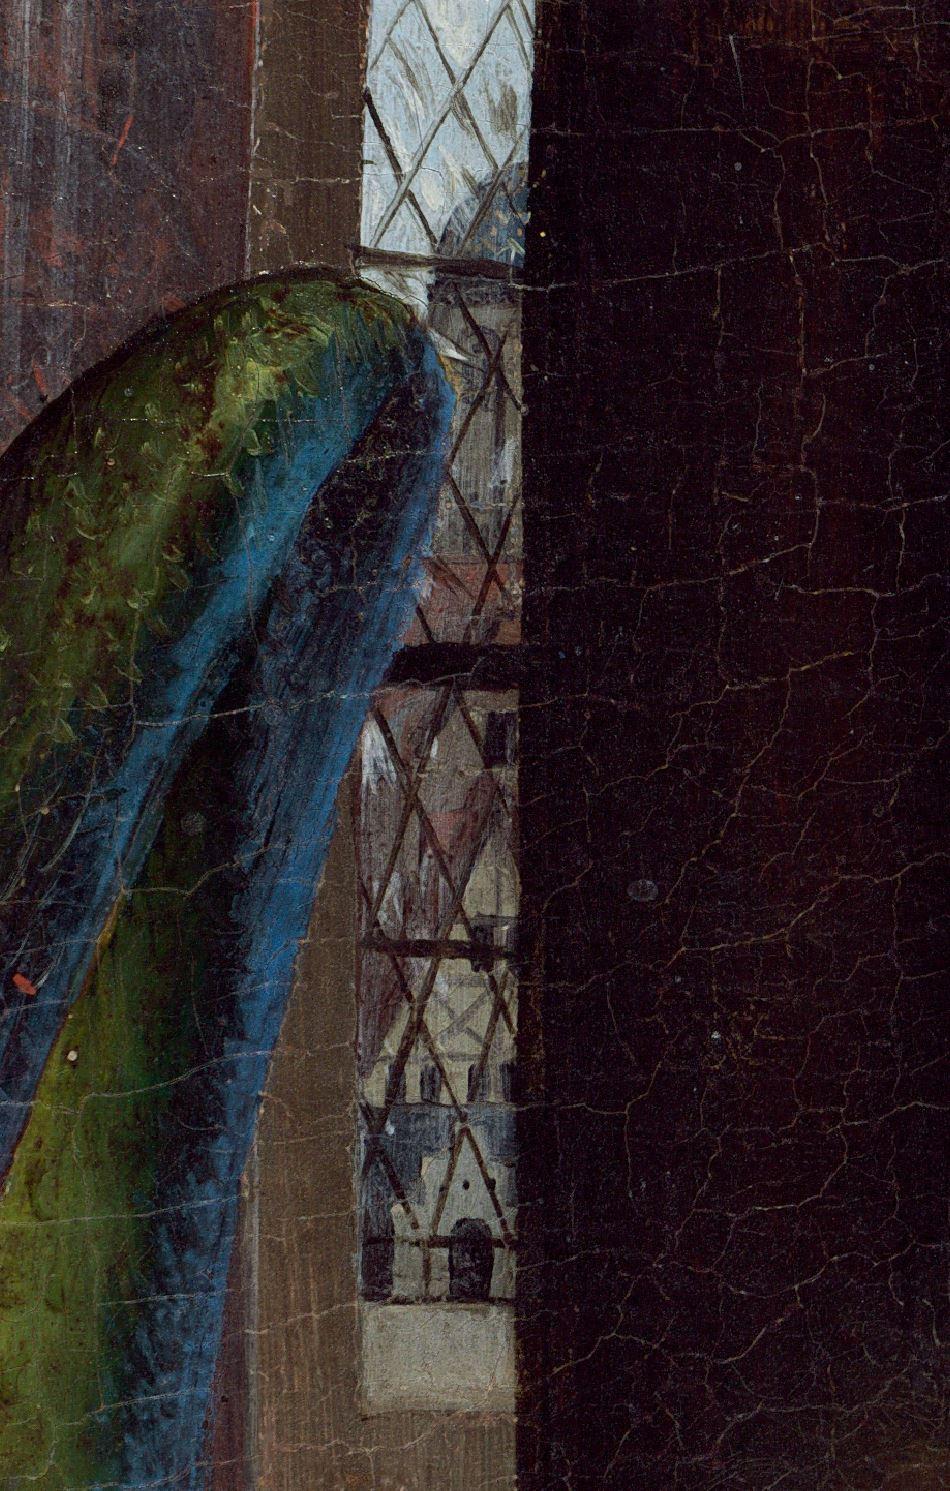 Van Eyck Annonciation 1434-36 NGA detail vitrail